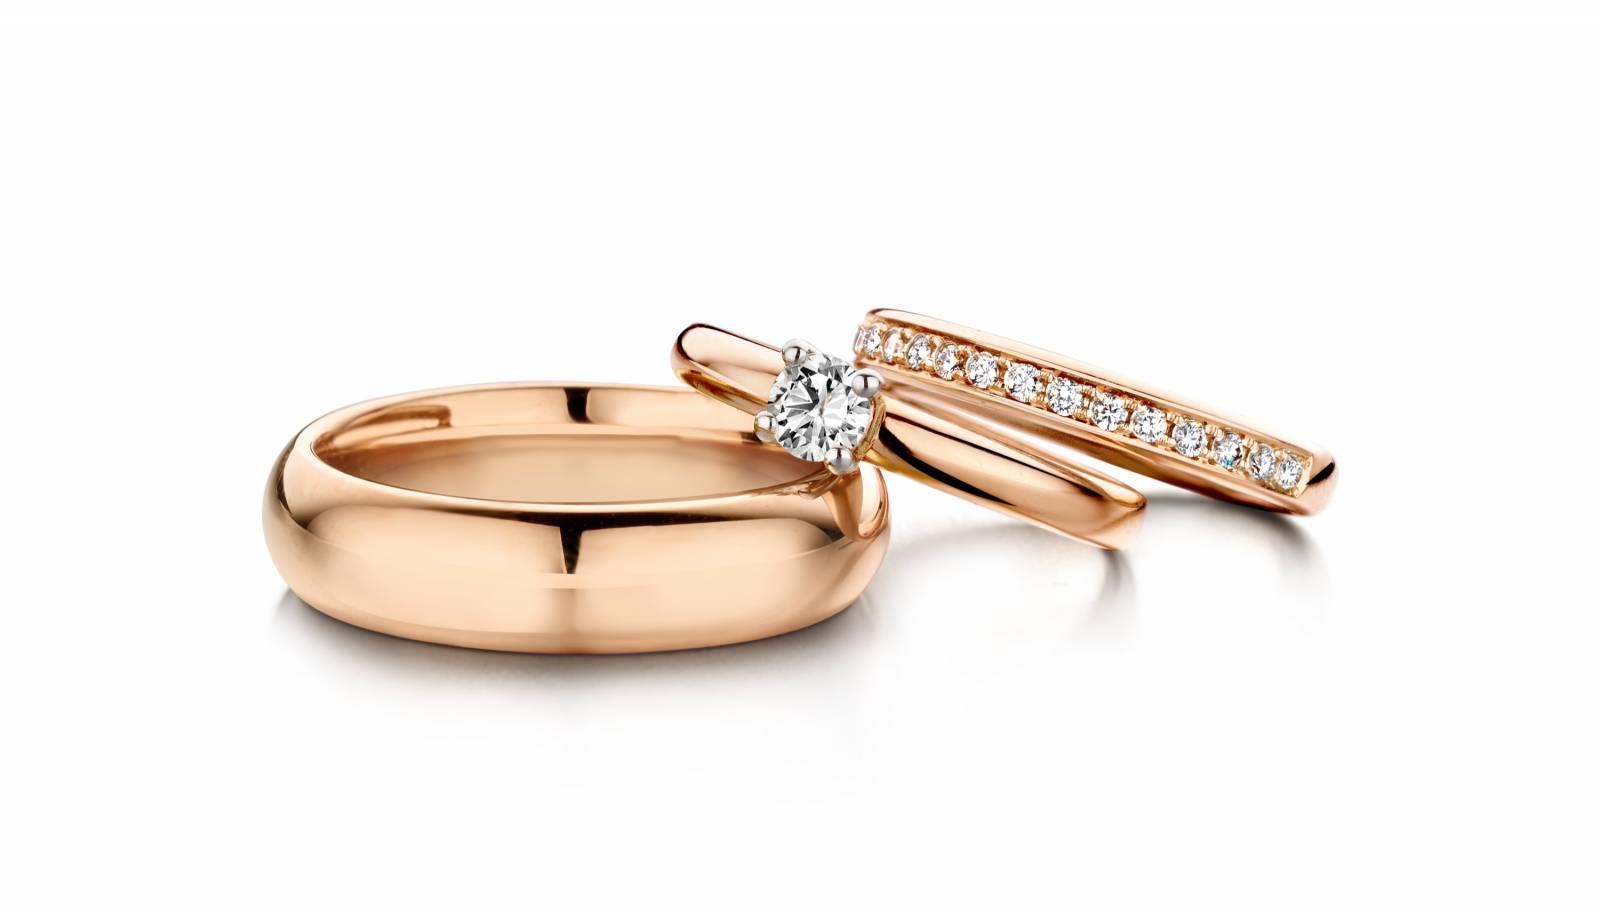 Juwelier Martens - Verlovingsringen - Trouwringen - Juwelen huwelijk - House of Weddings - 2